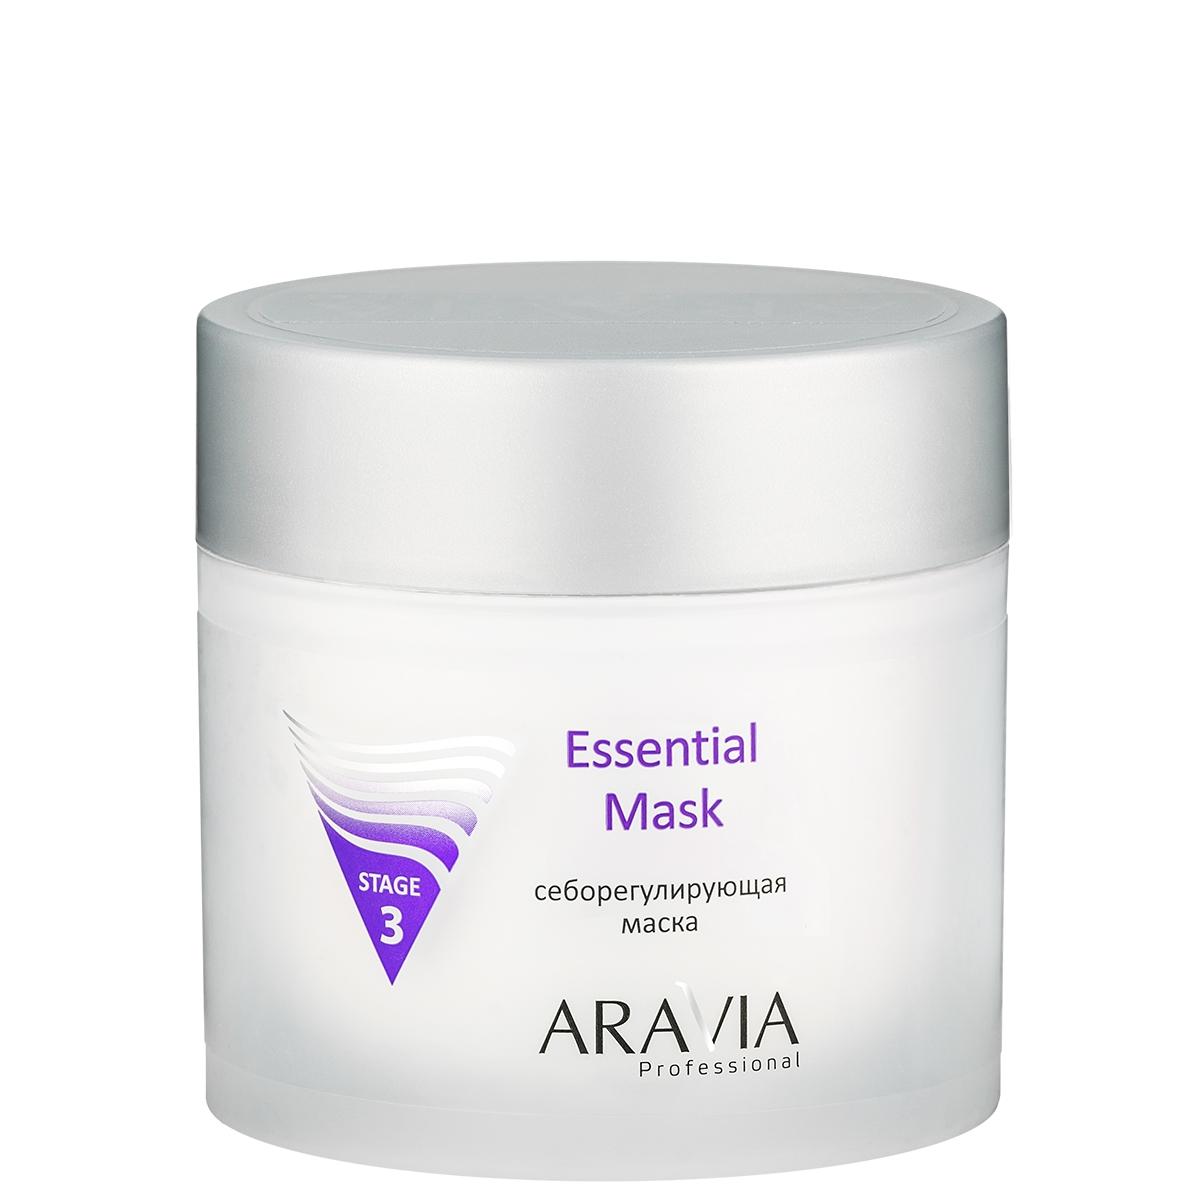 ARAVIA Себорегулирующая маска Essential Mask, 300 мл aravia себорегулирующая маска отзывы